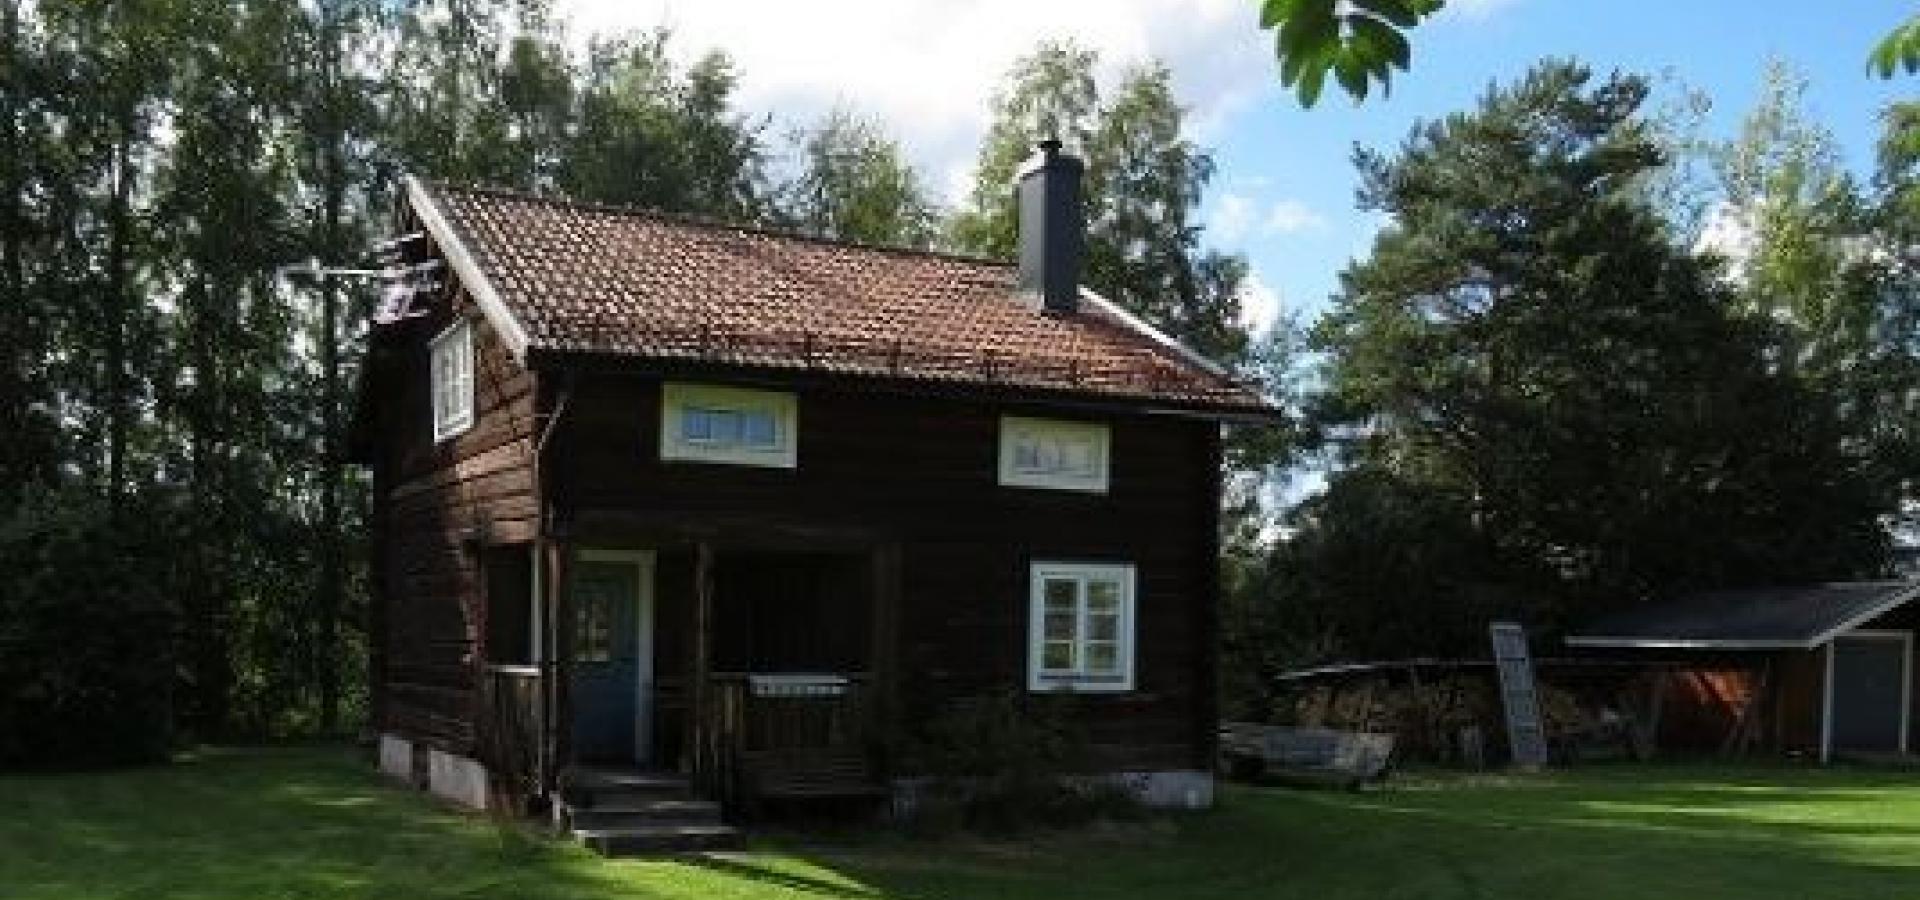 lvdalen 105 | Visit Dalarna